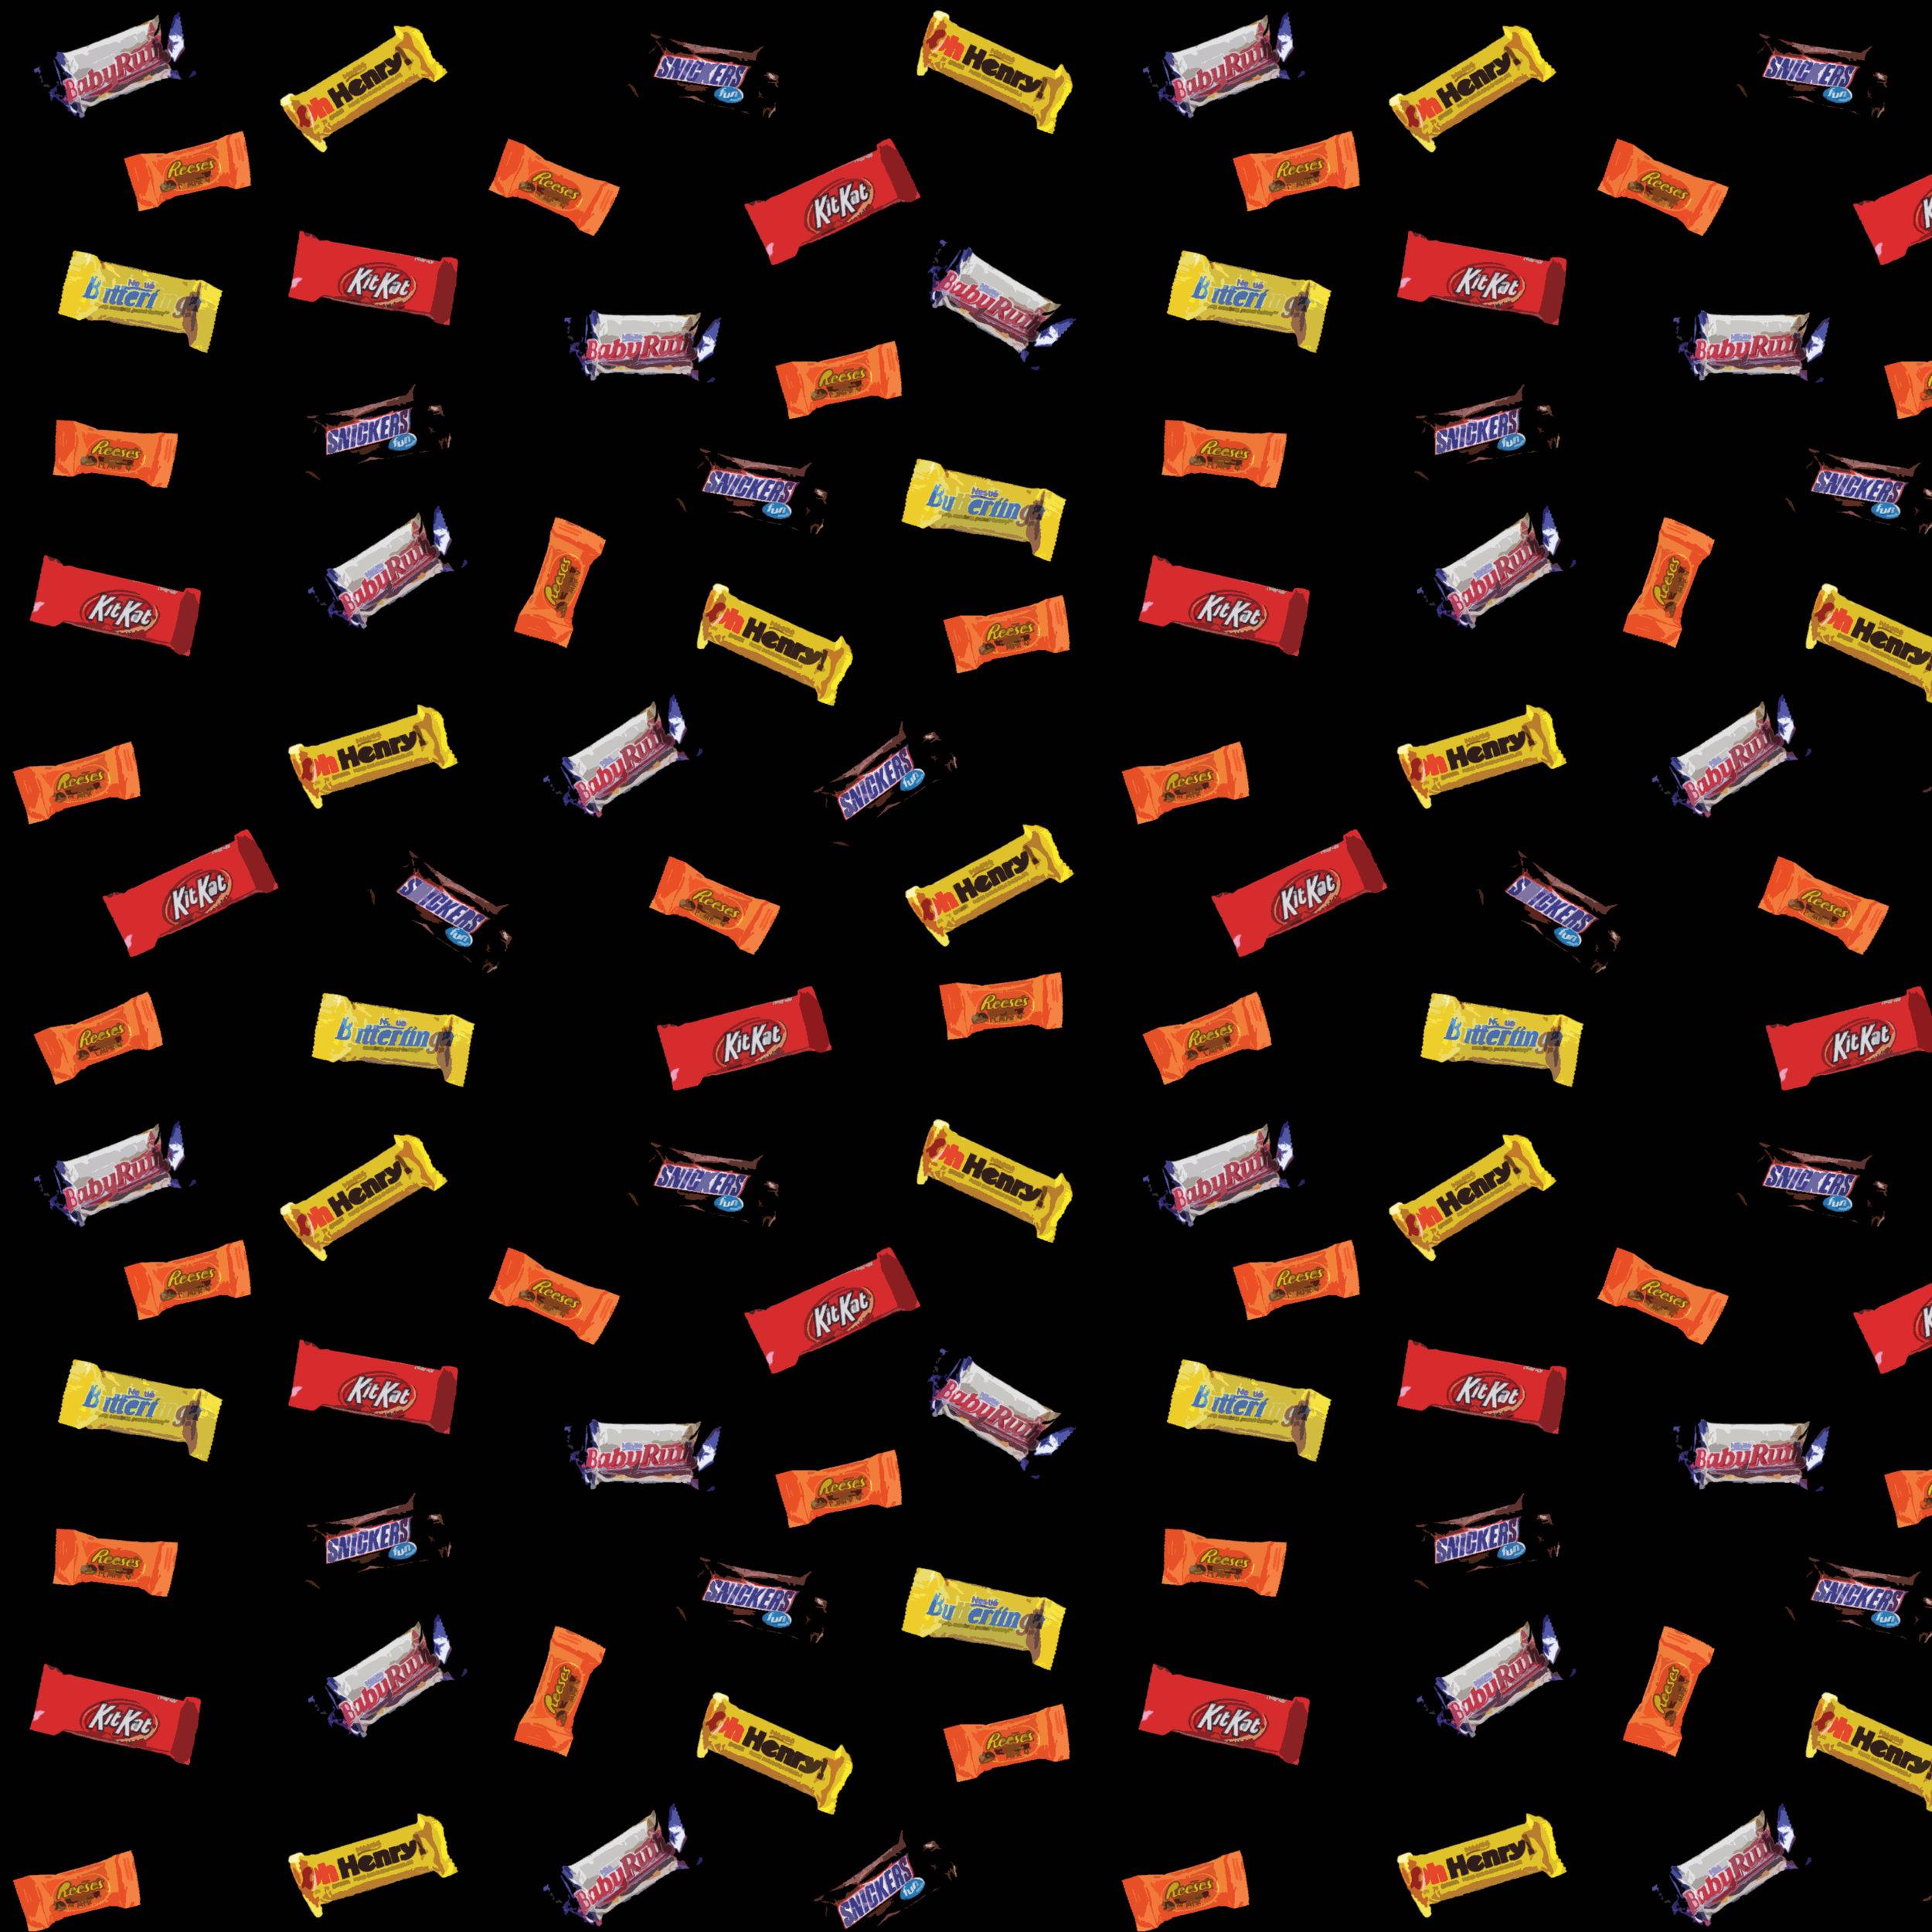 candies-bandana.jpg